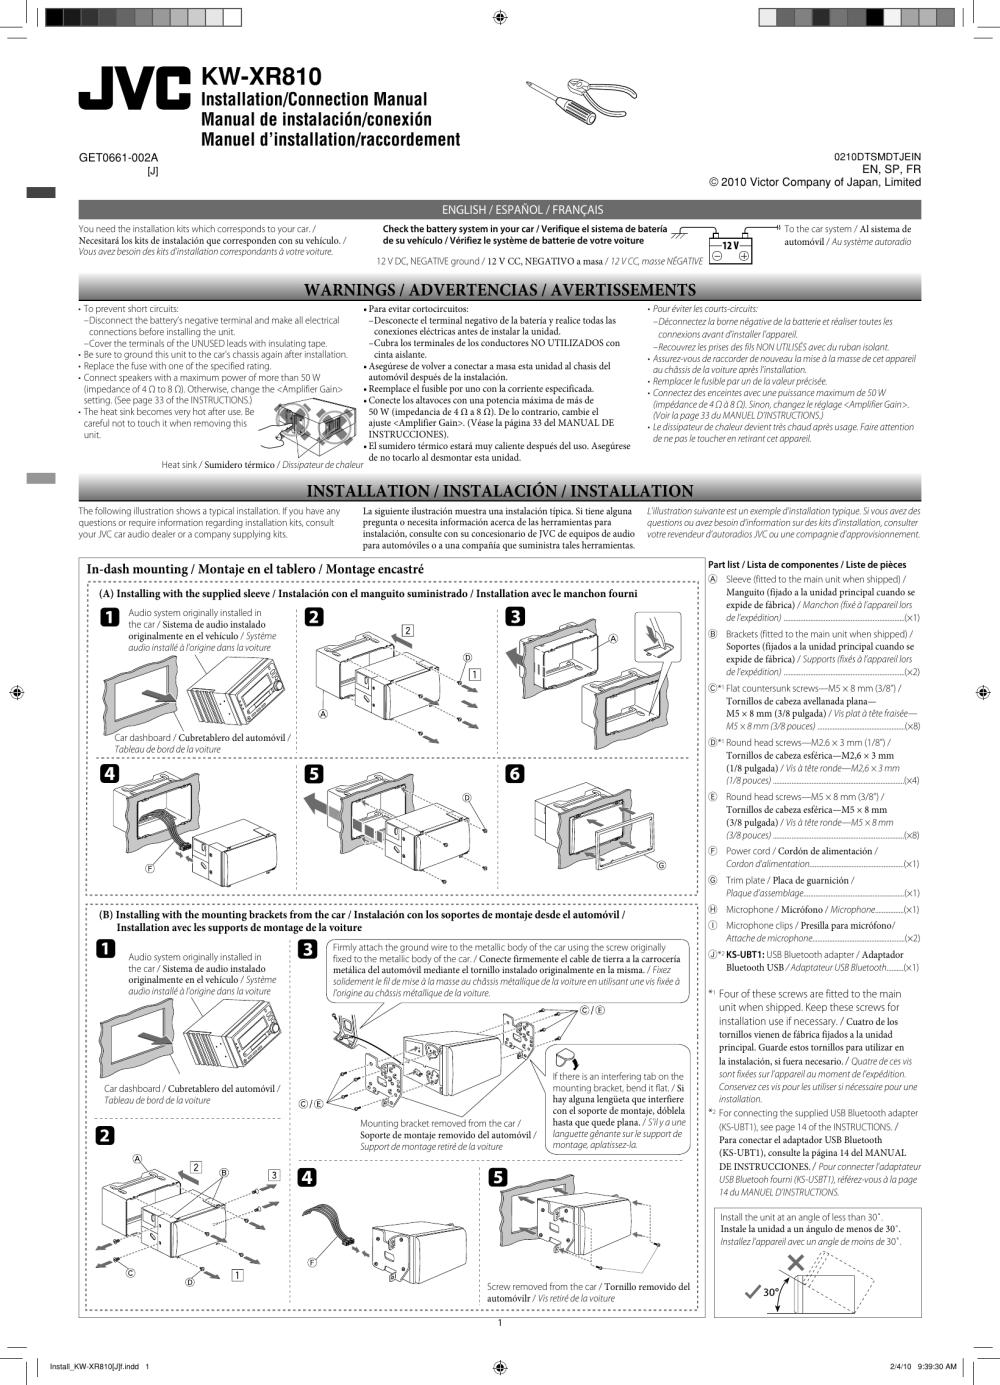 medium resolution of jvc kw xr810 installation manual install kw xr810 j fpage 1 of 4 jvc jvc